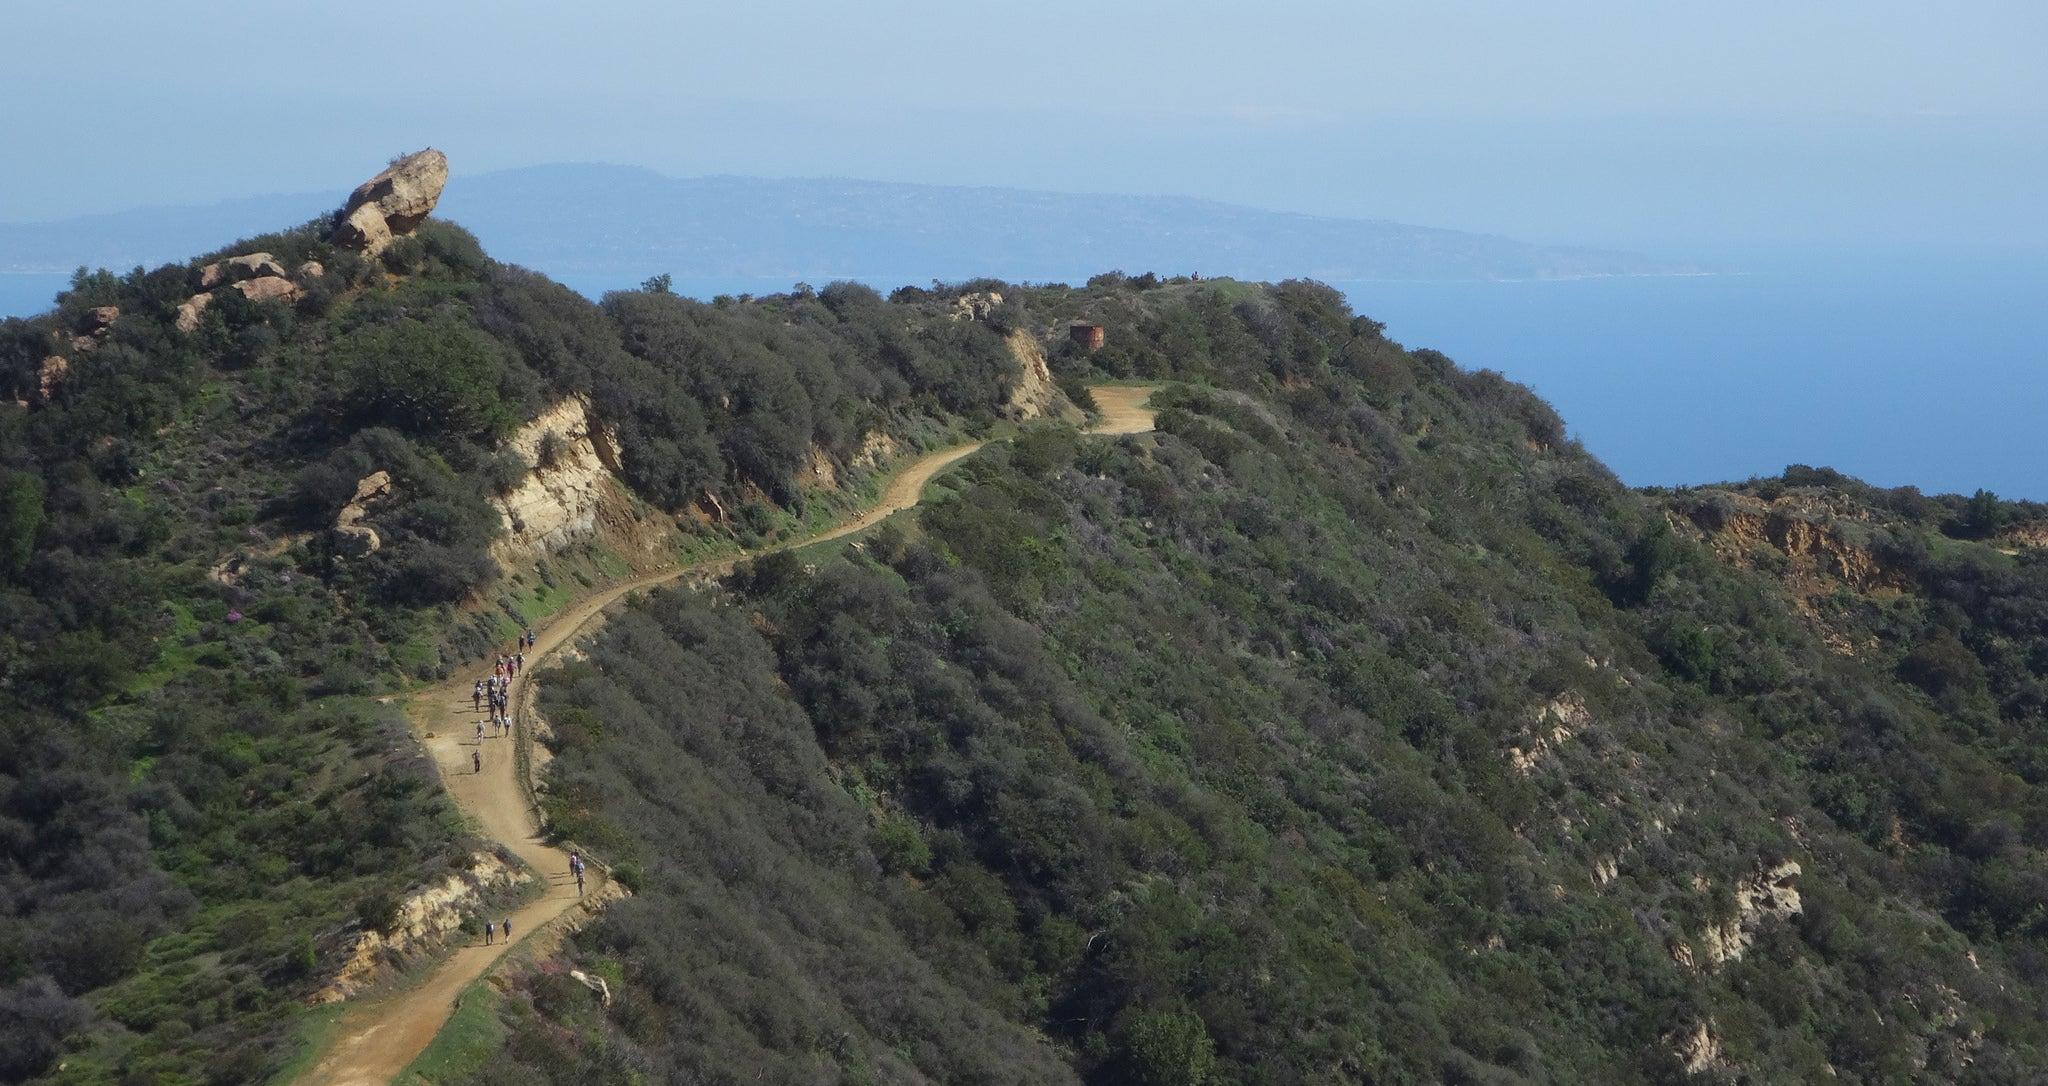 backbone-trail bbt cities hiking los-angeles national-park-service santa-monica-mountains thru-hiking urban-trails urbanism walking